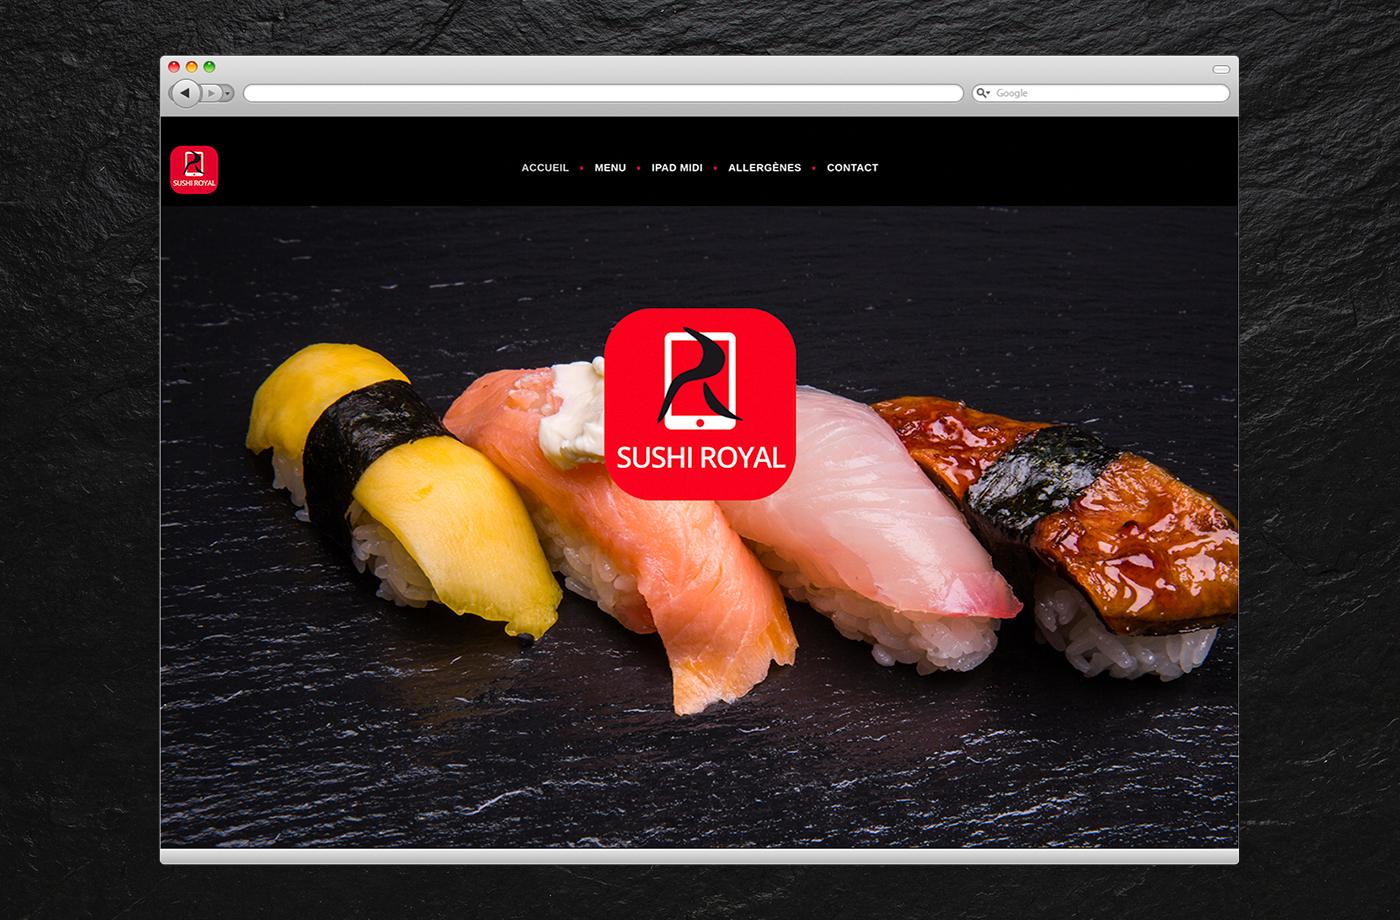 sushi restaurant luxembourg